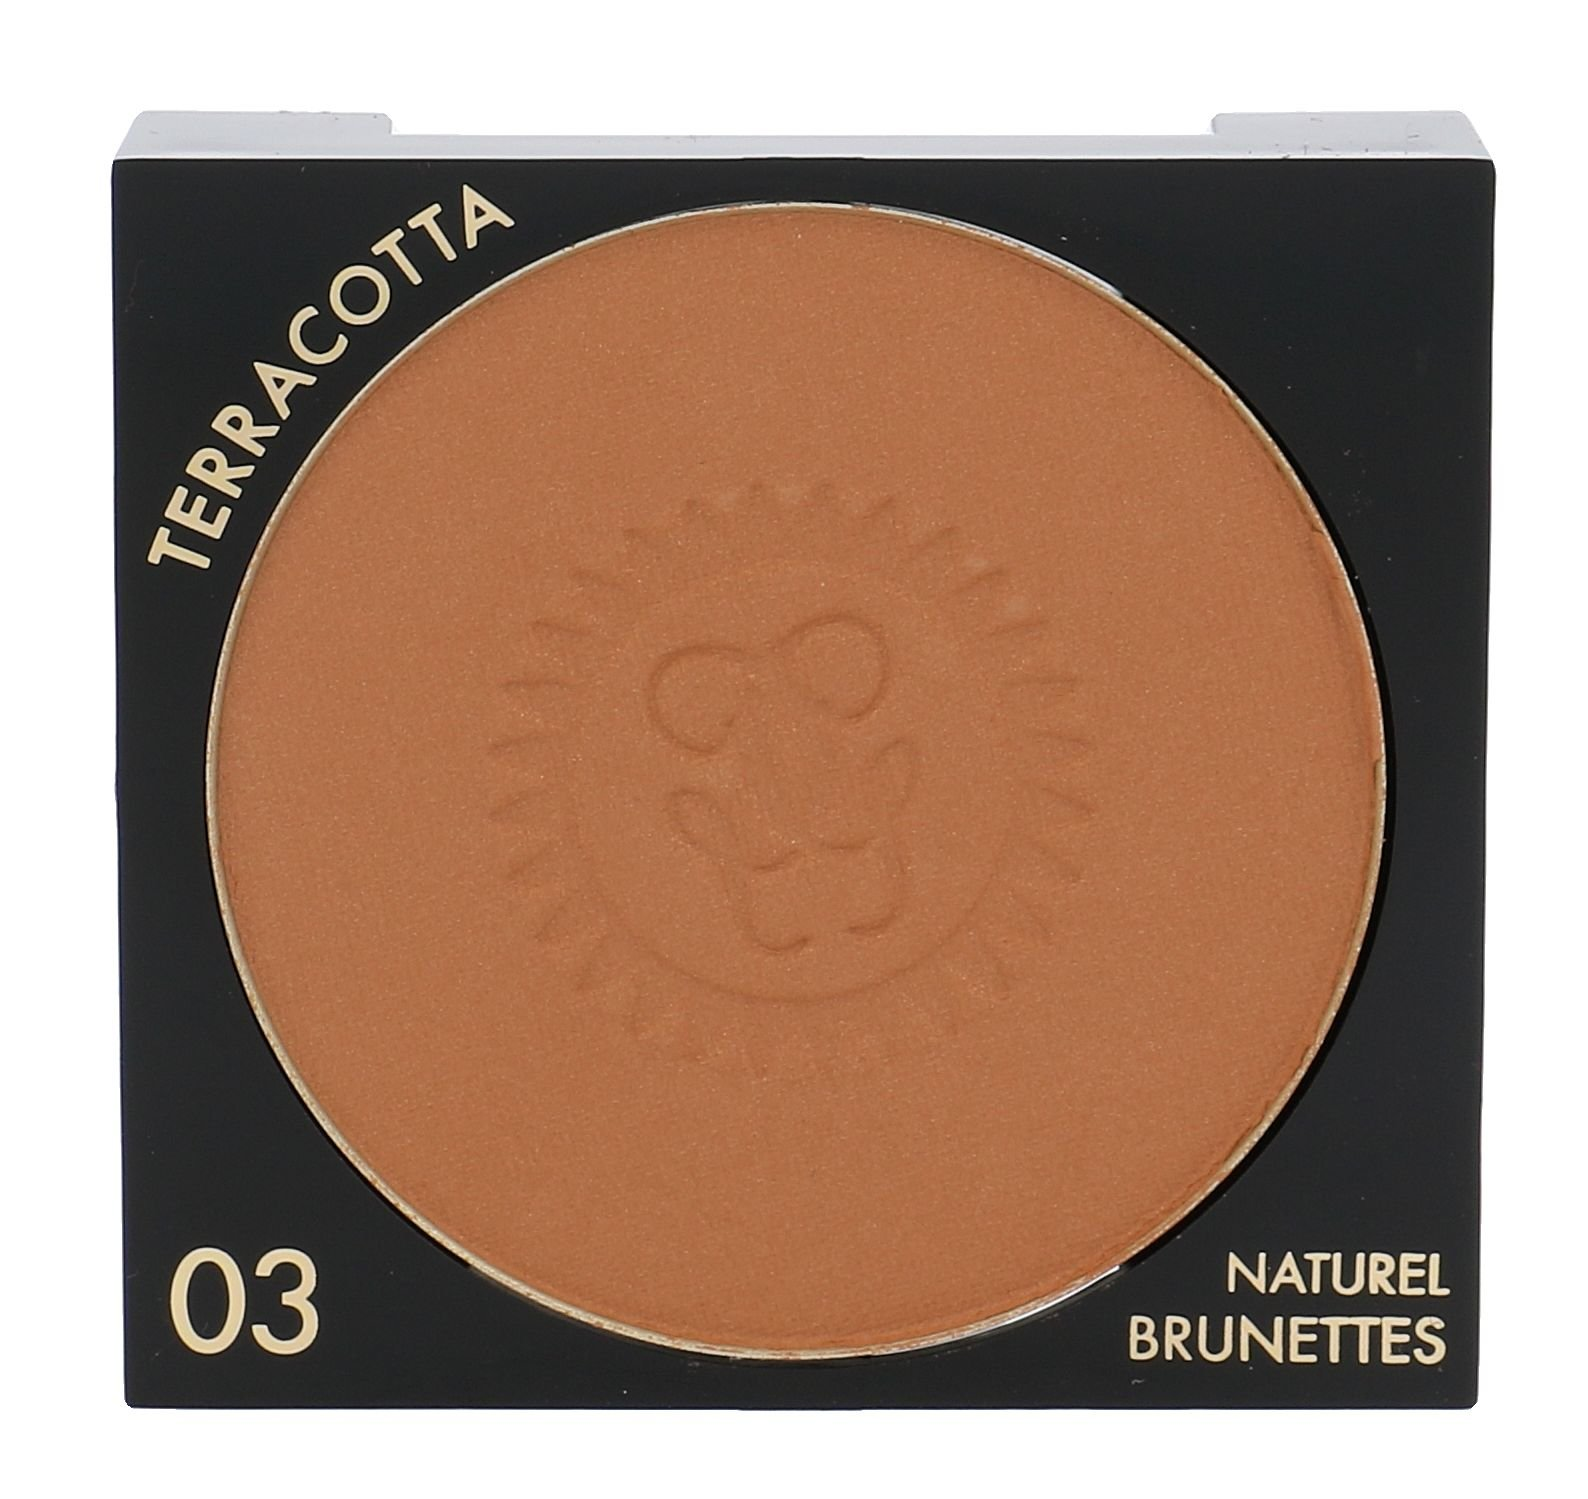 Guerlain Terracotta Cosmetic 6ml 03 Natural-Brunettes